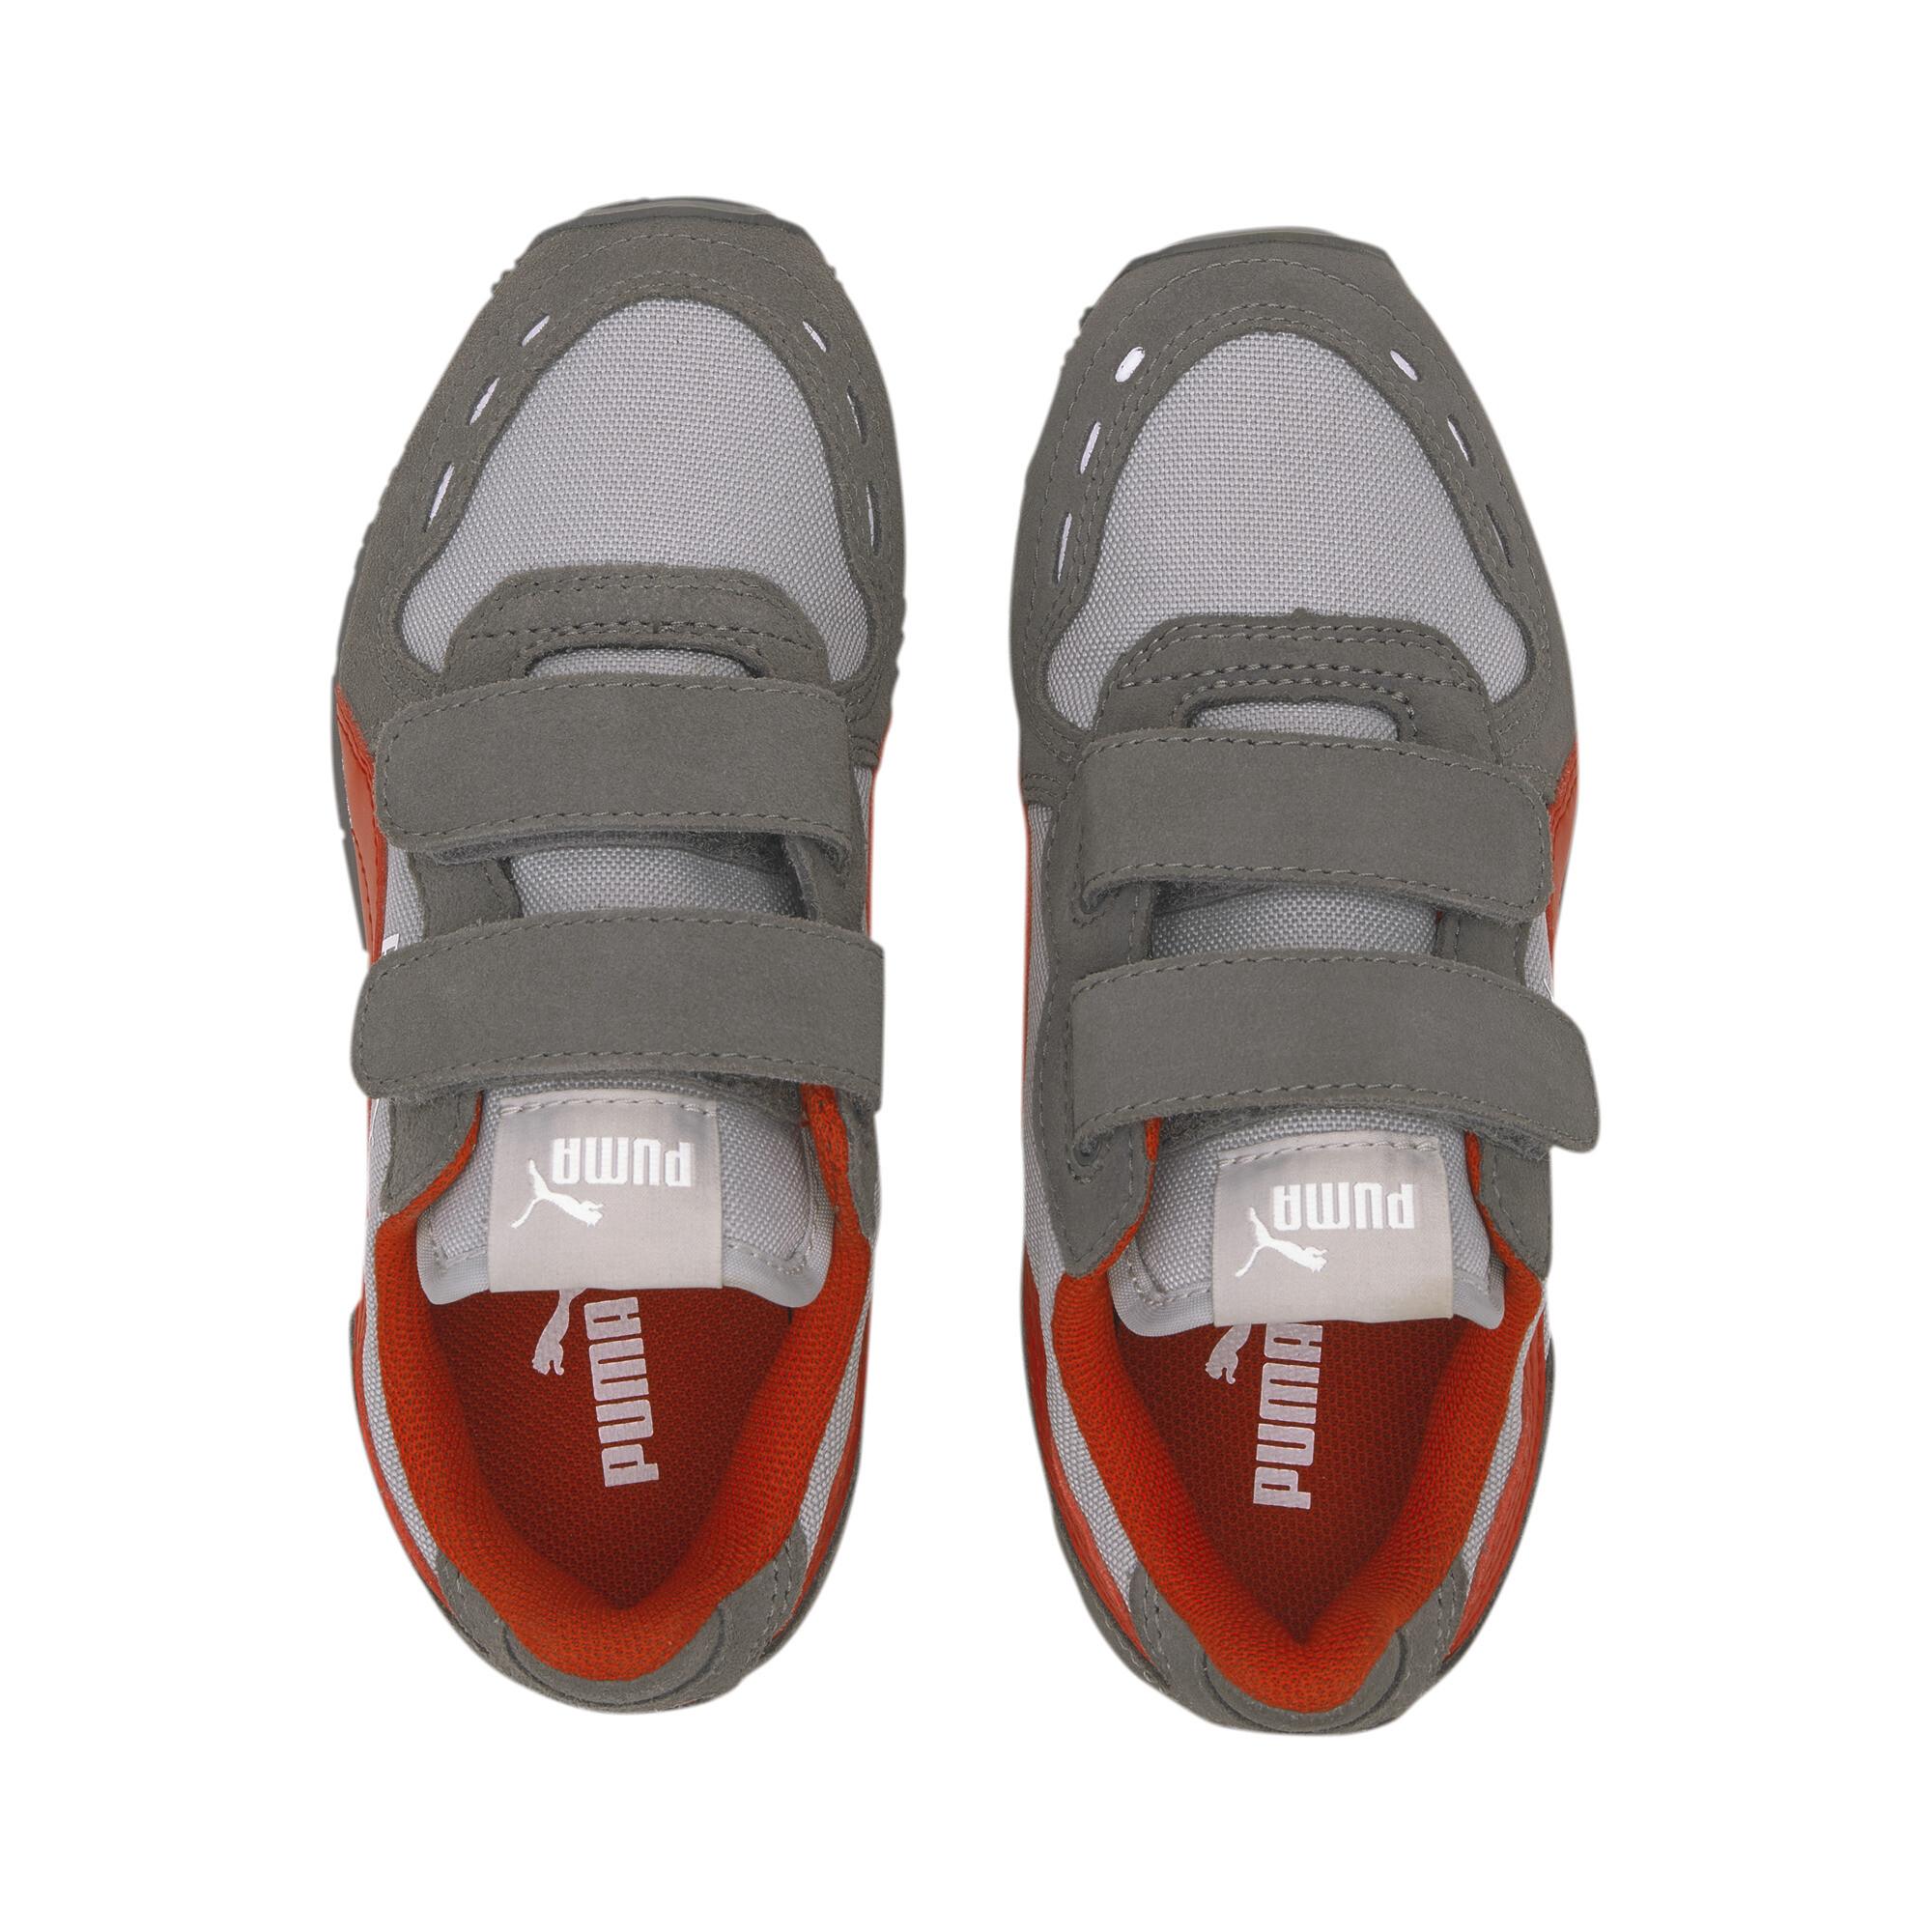 PUMA-Cabana-Racer-Little-Kids-039-Shoes-Kids-Shoe-Kids thumbnail 30